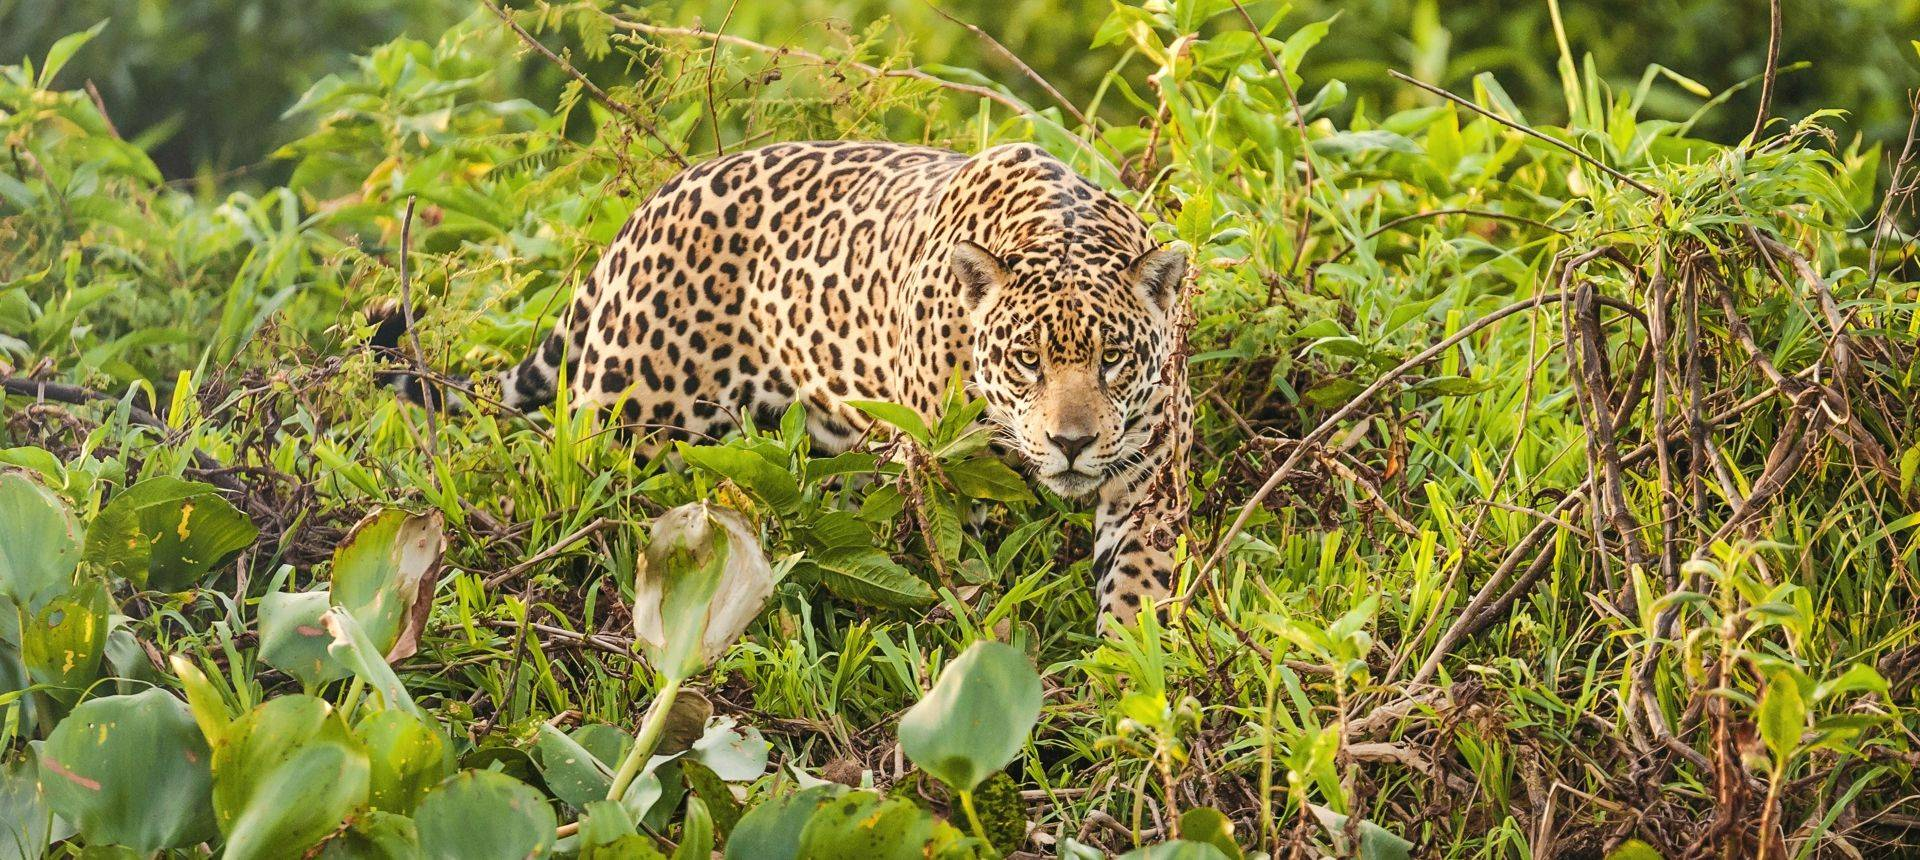 Brazil Just Jaguars